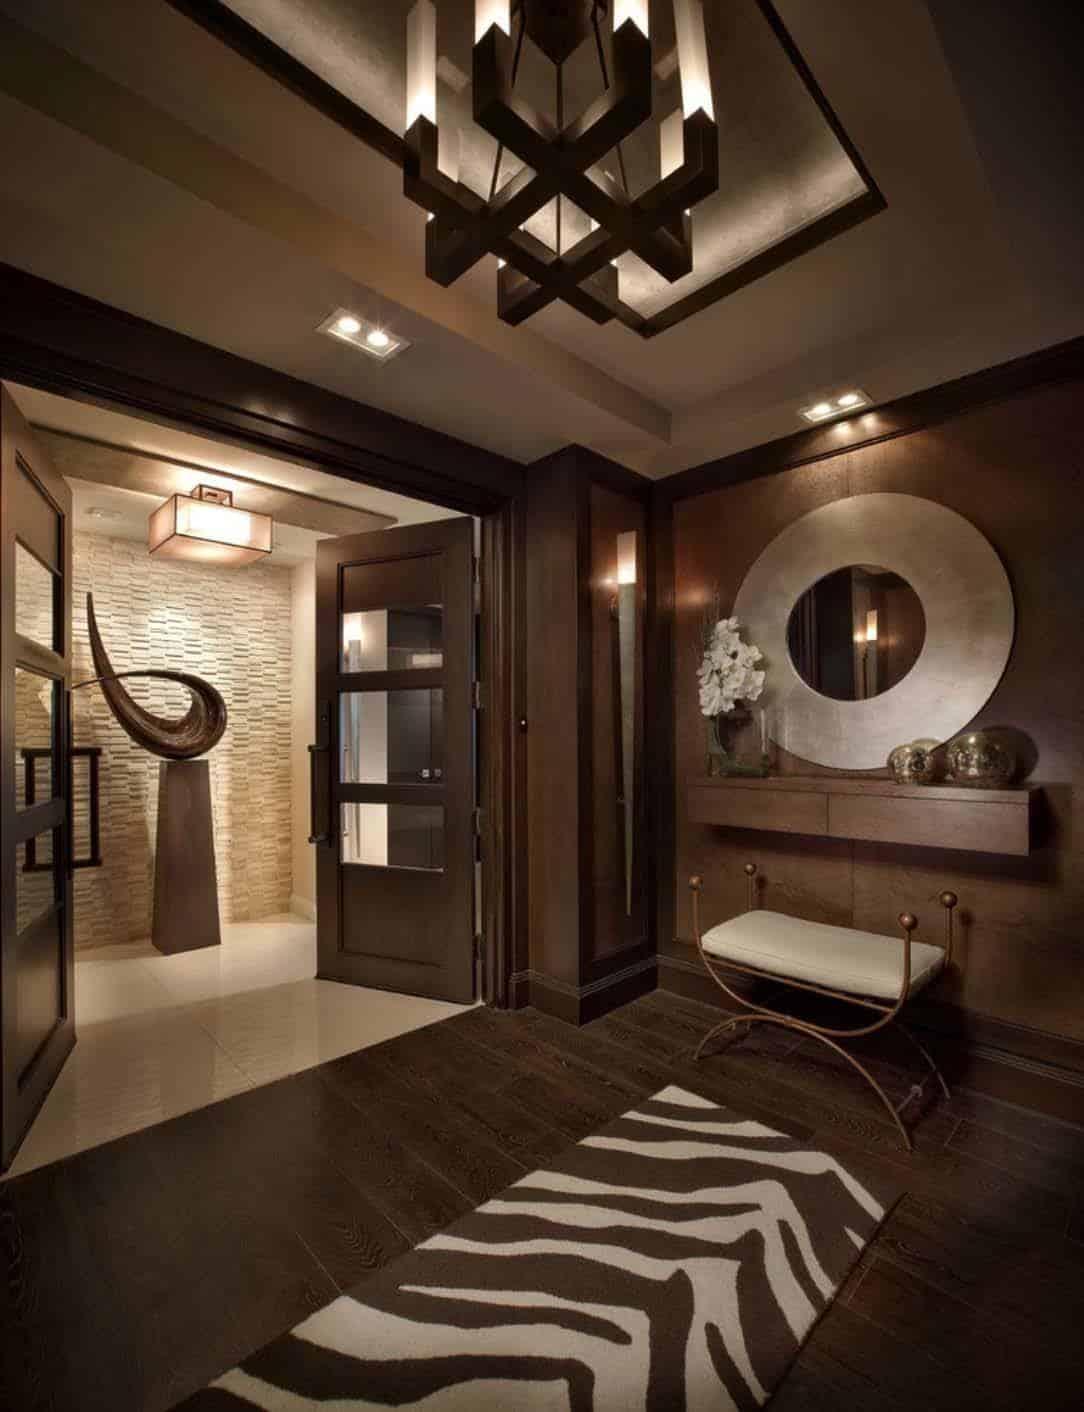 Impeccable design details in luxurious boca raton residence for Brown s interior design boca raton fl